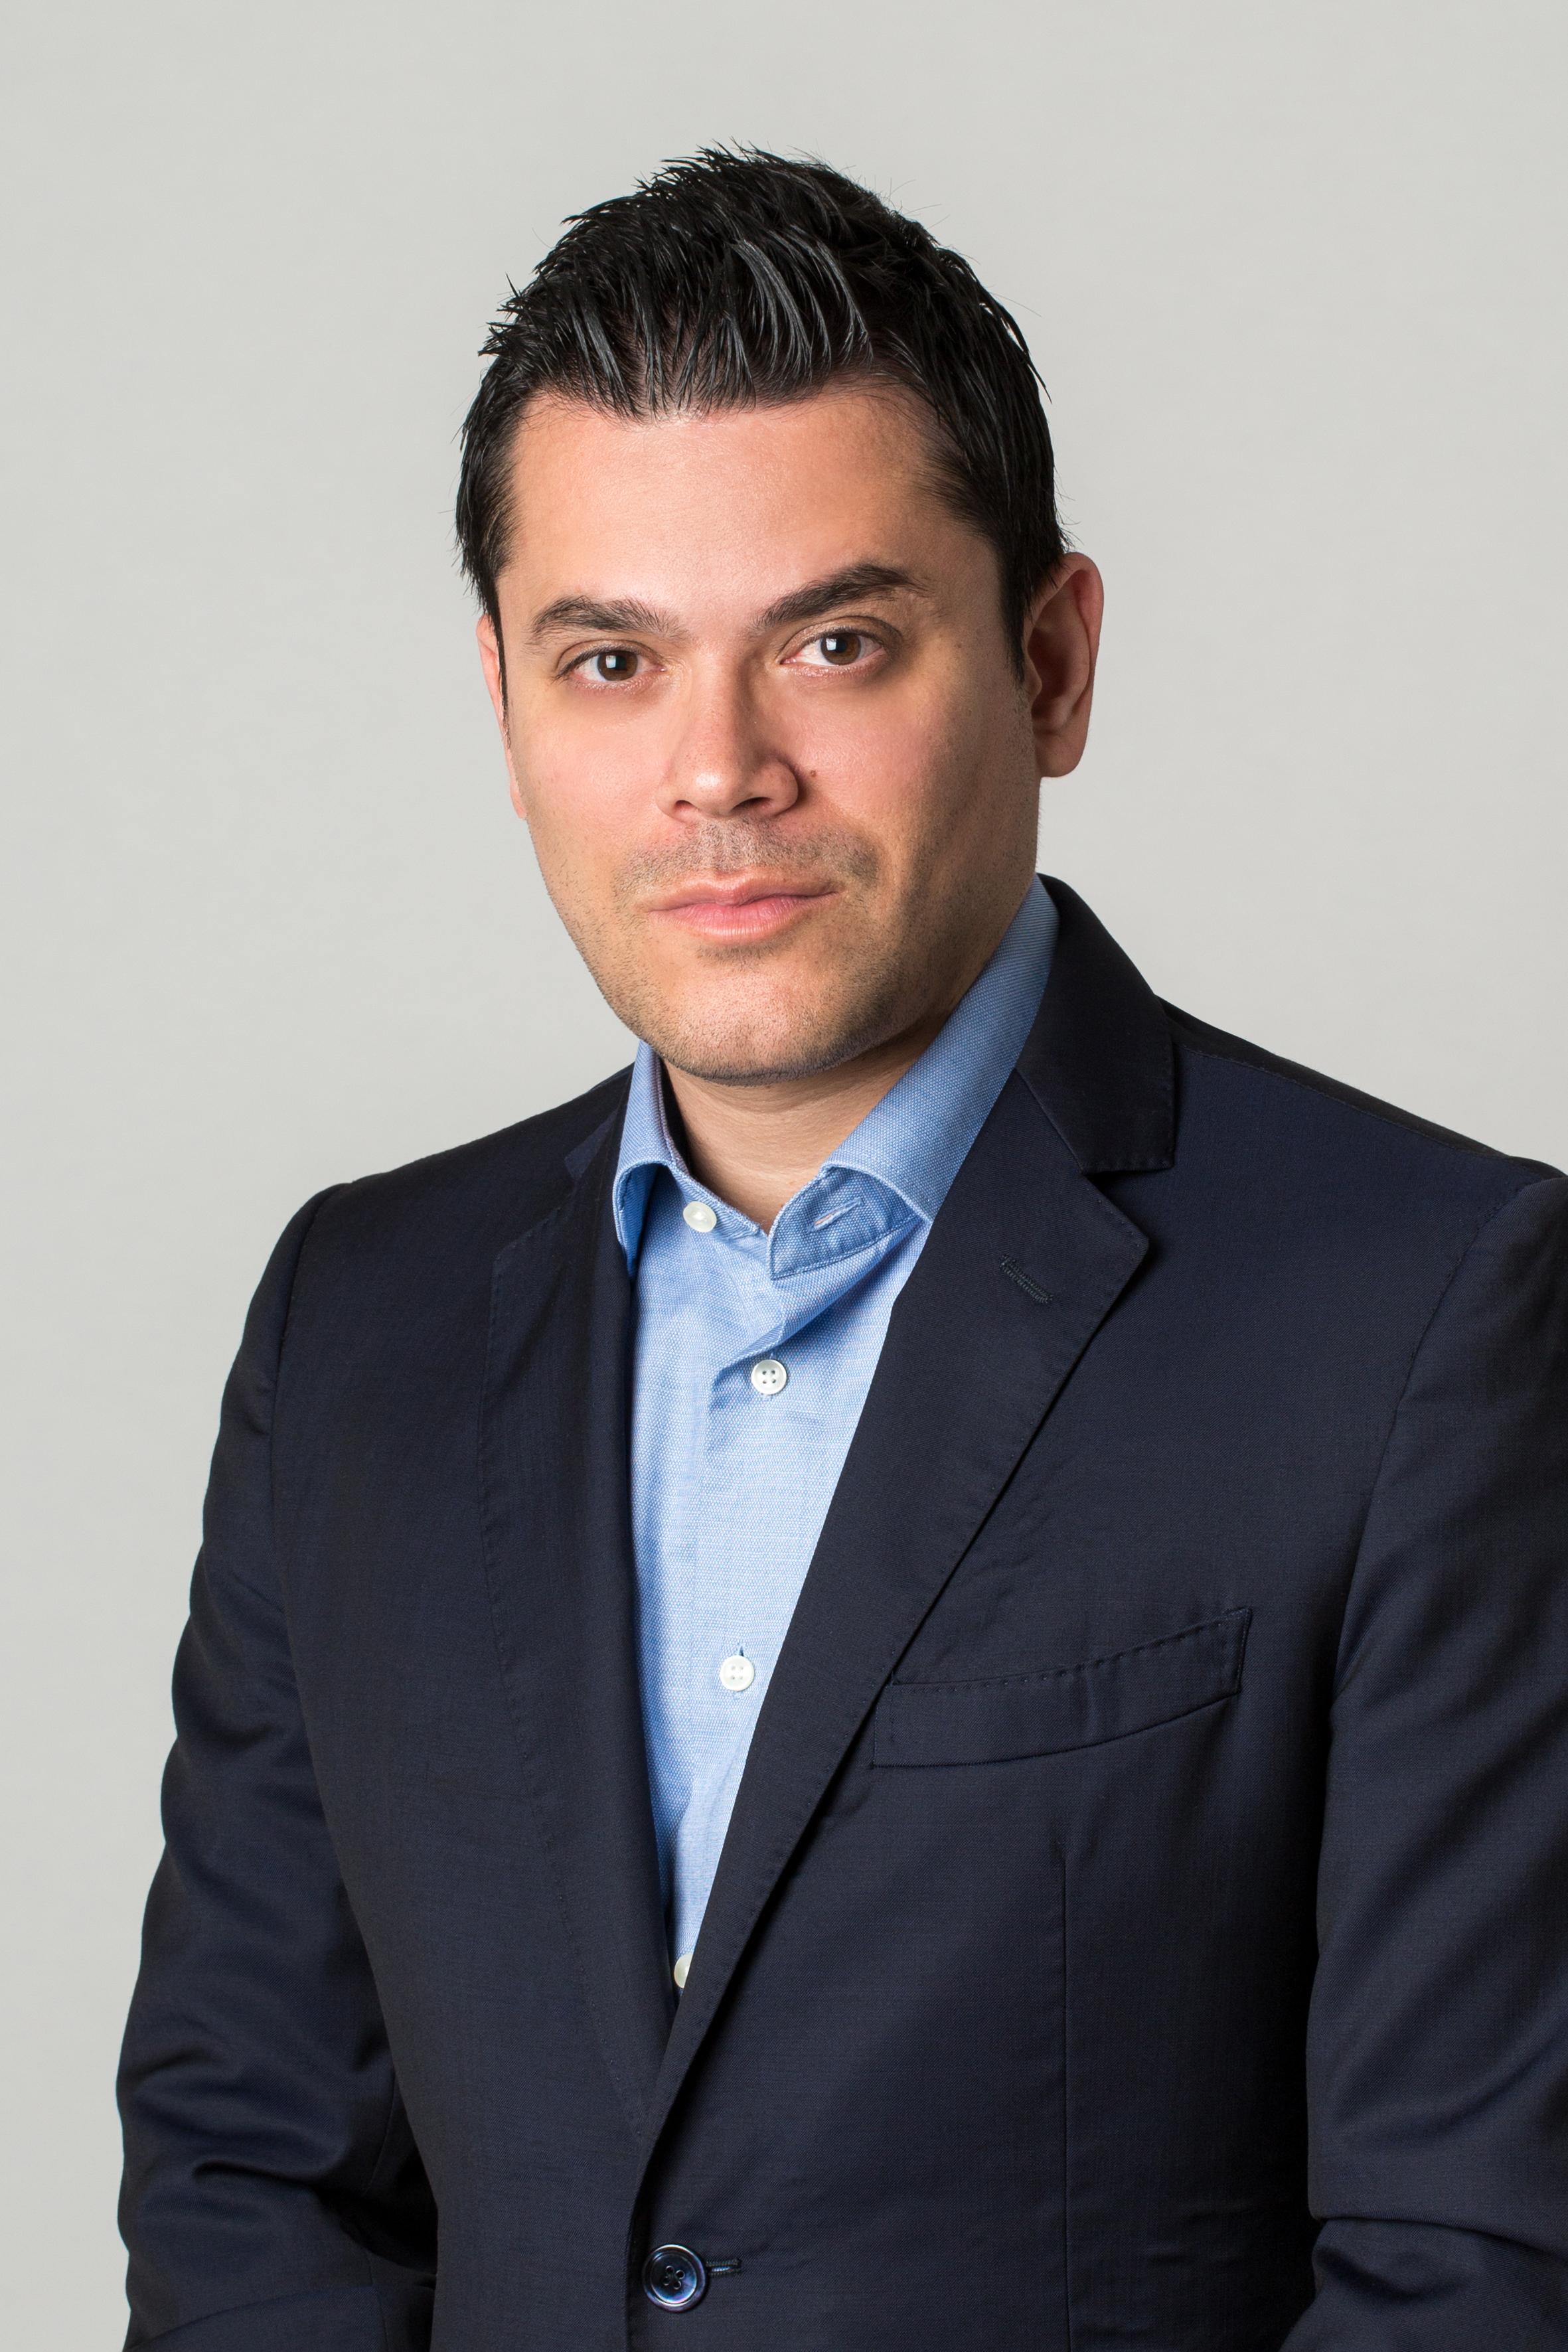 Professor Dr. Nikolaos P. Polyzos, MD, PhD